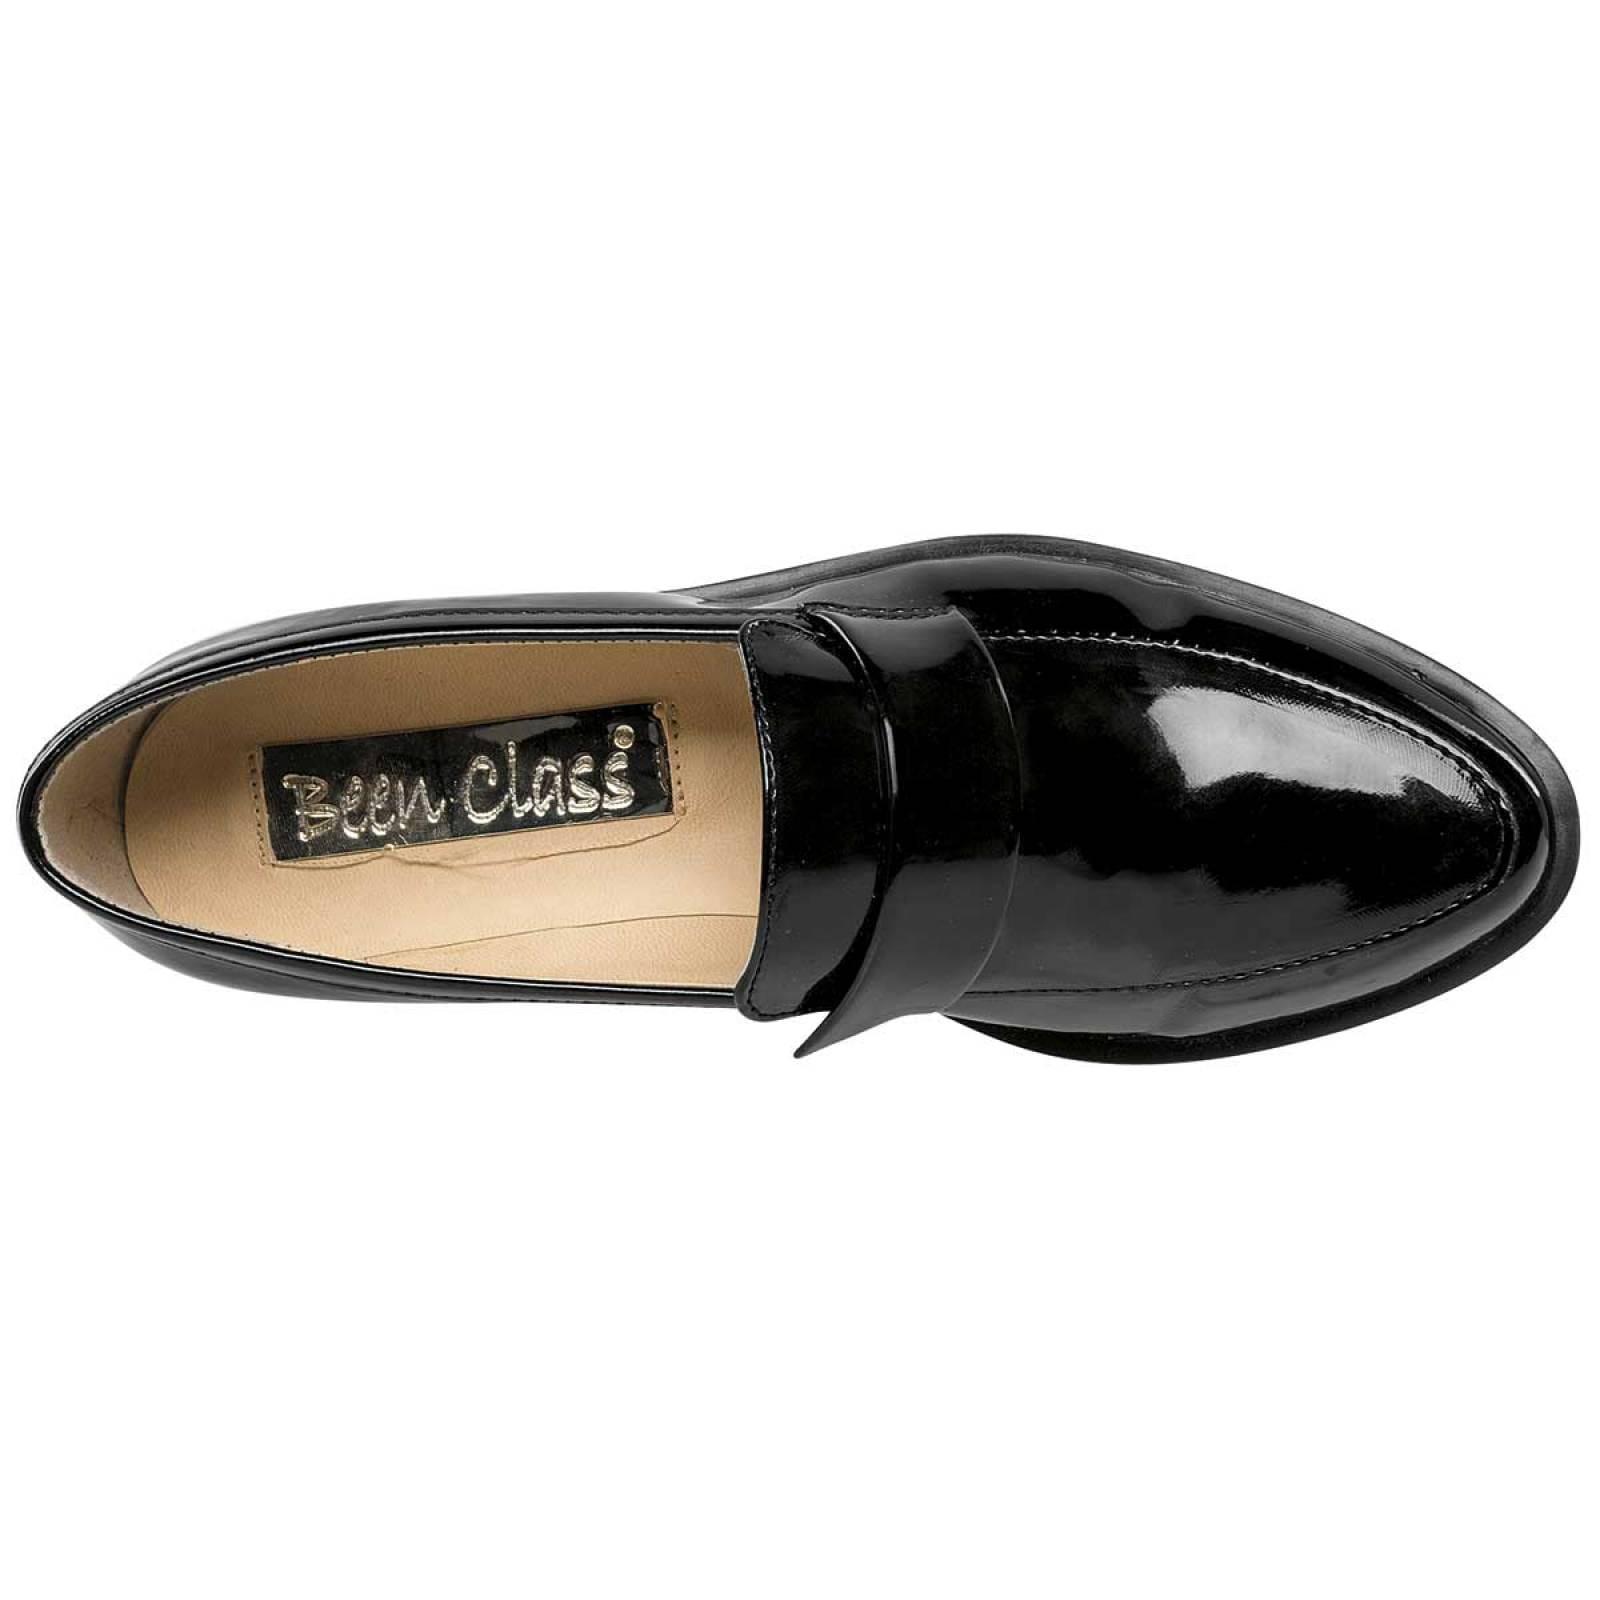 Been class Zapato Mujer Negro charol